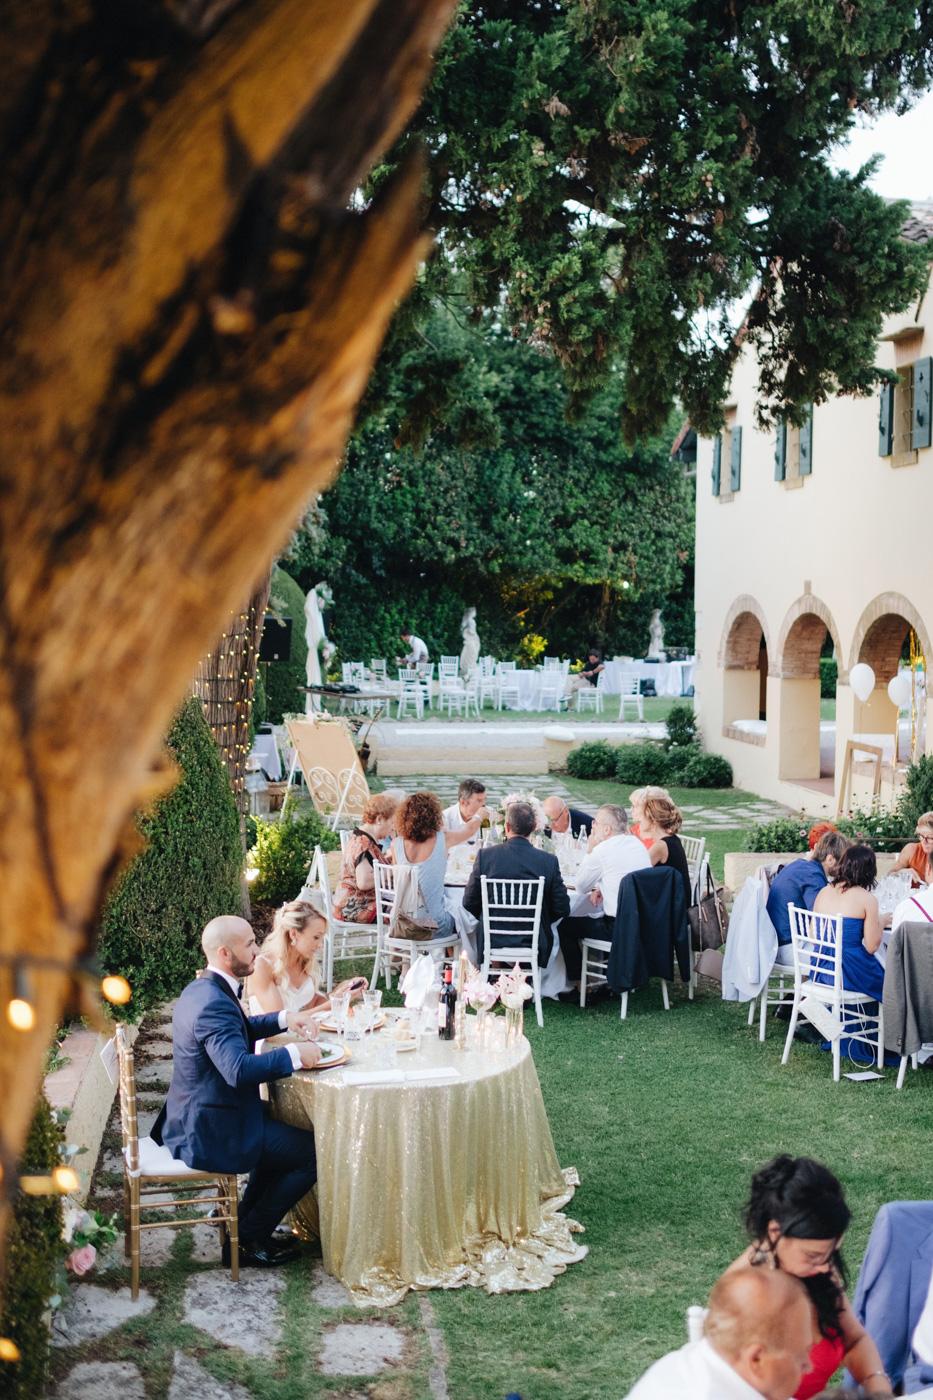 Matrimoni all'italiana wedding photographer italy-138.jpg